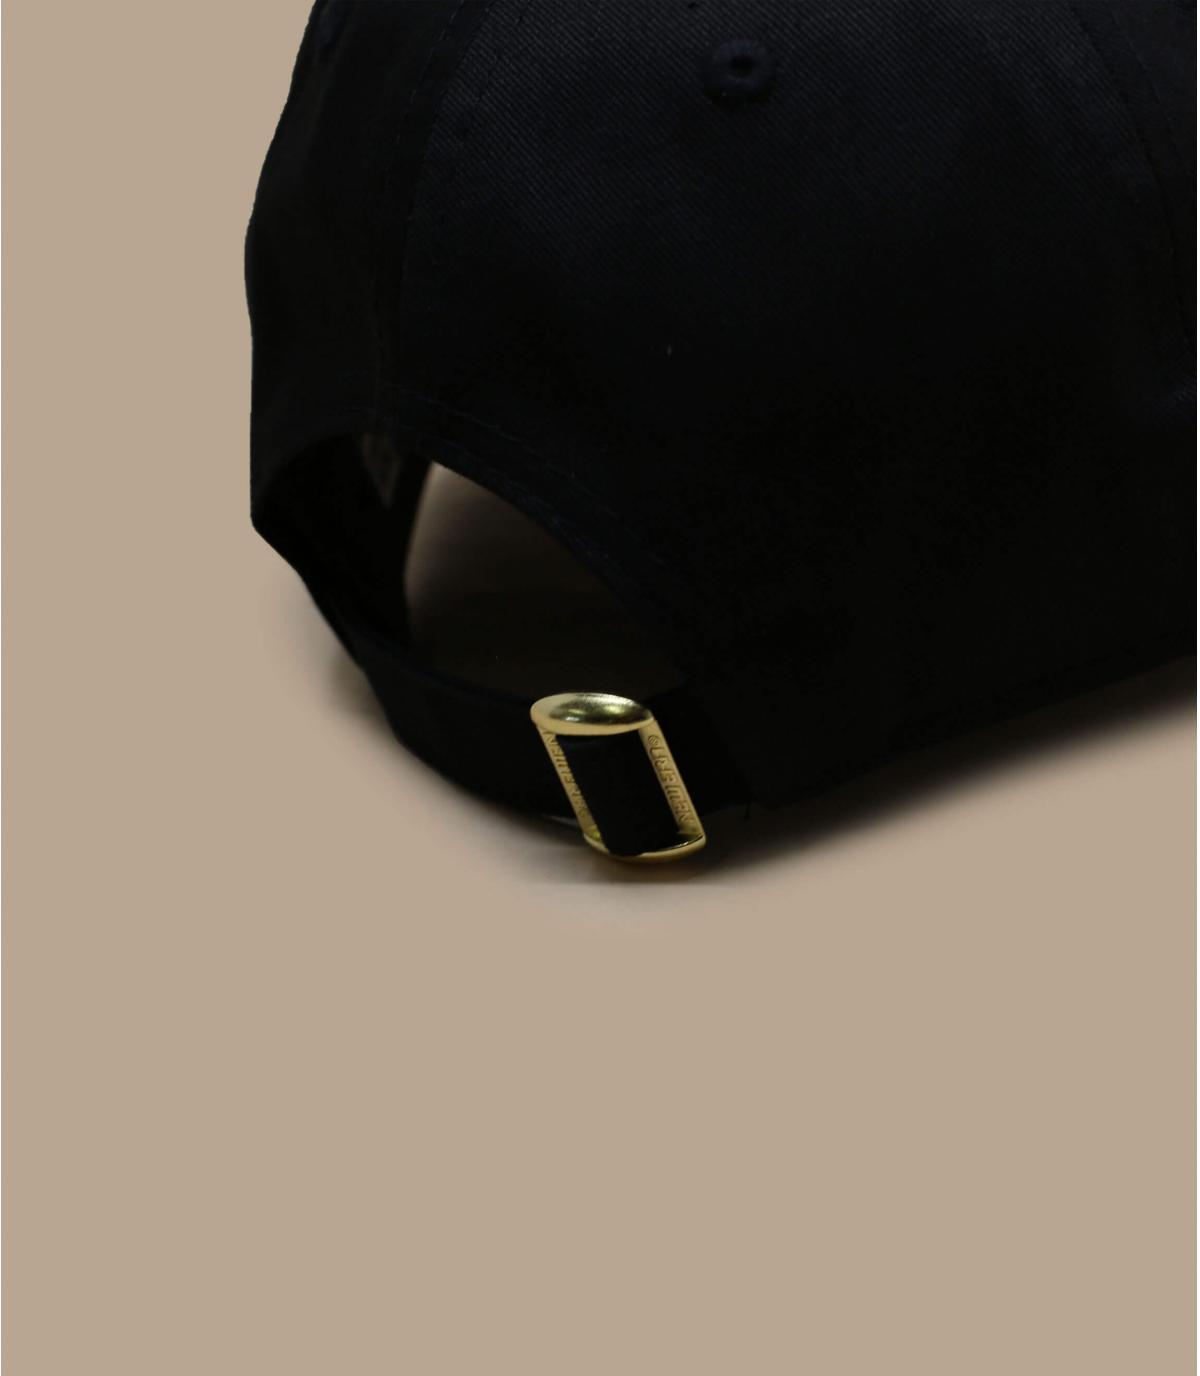 Detalles Metallic Logo 940 Bulls black gold imagen 4